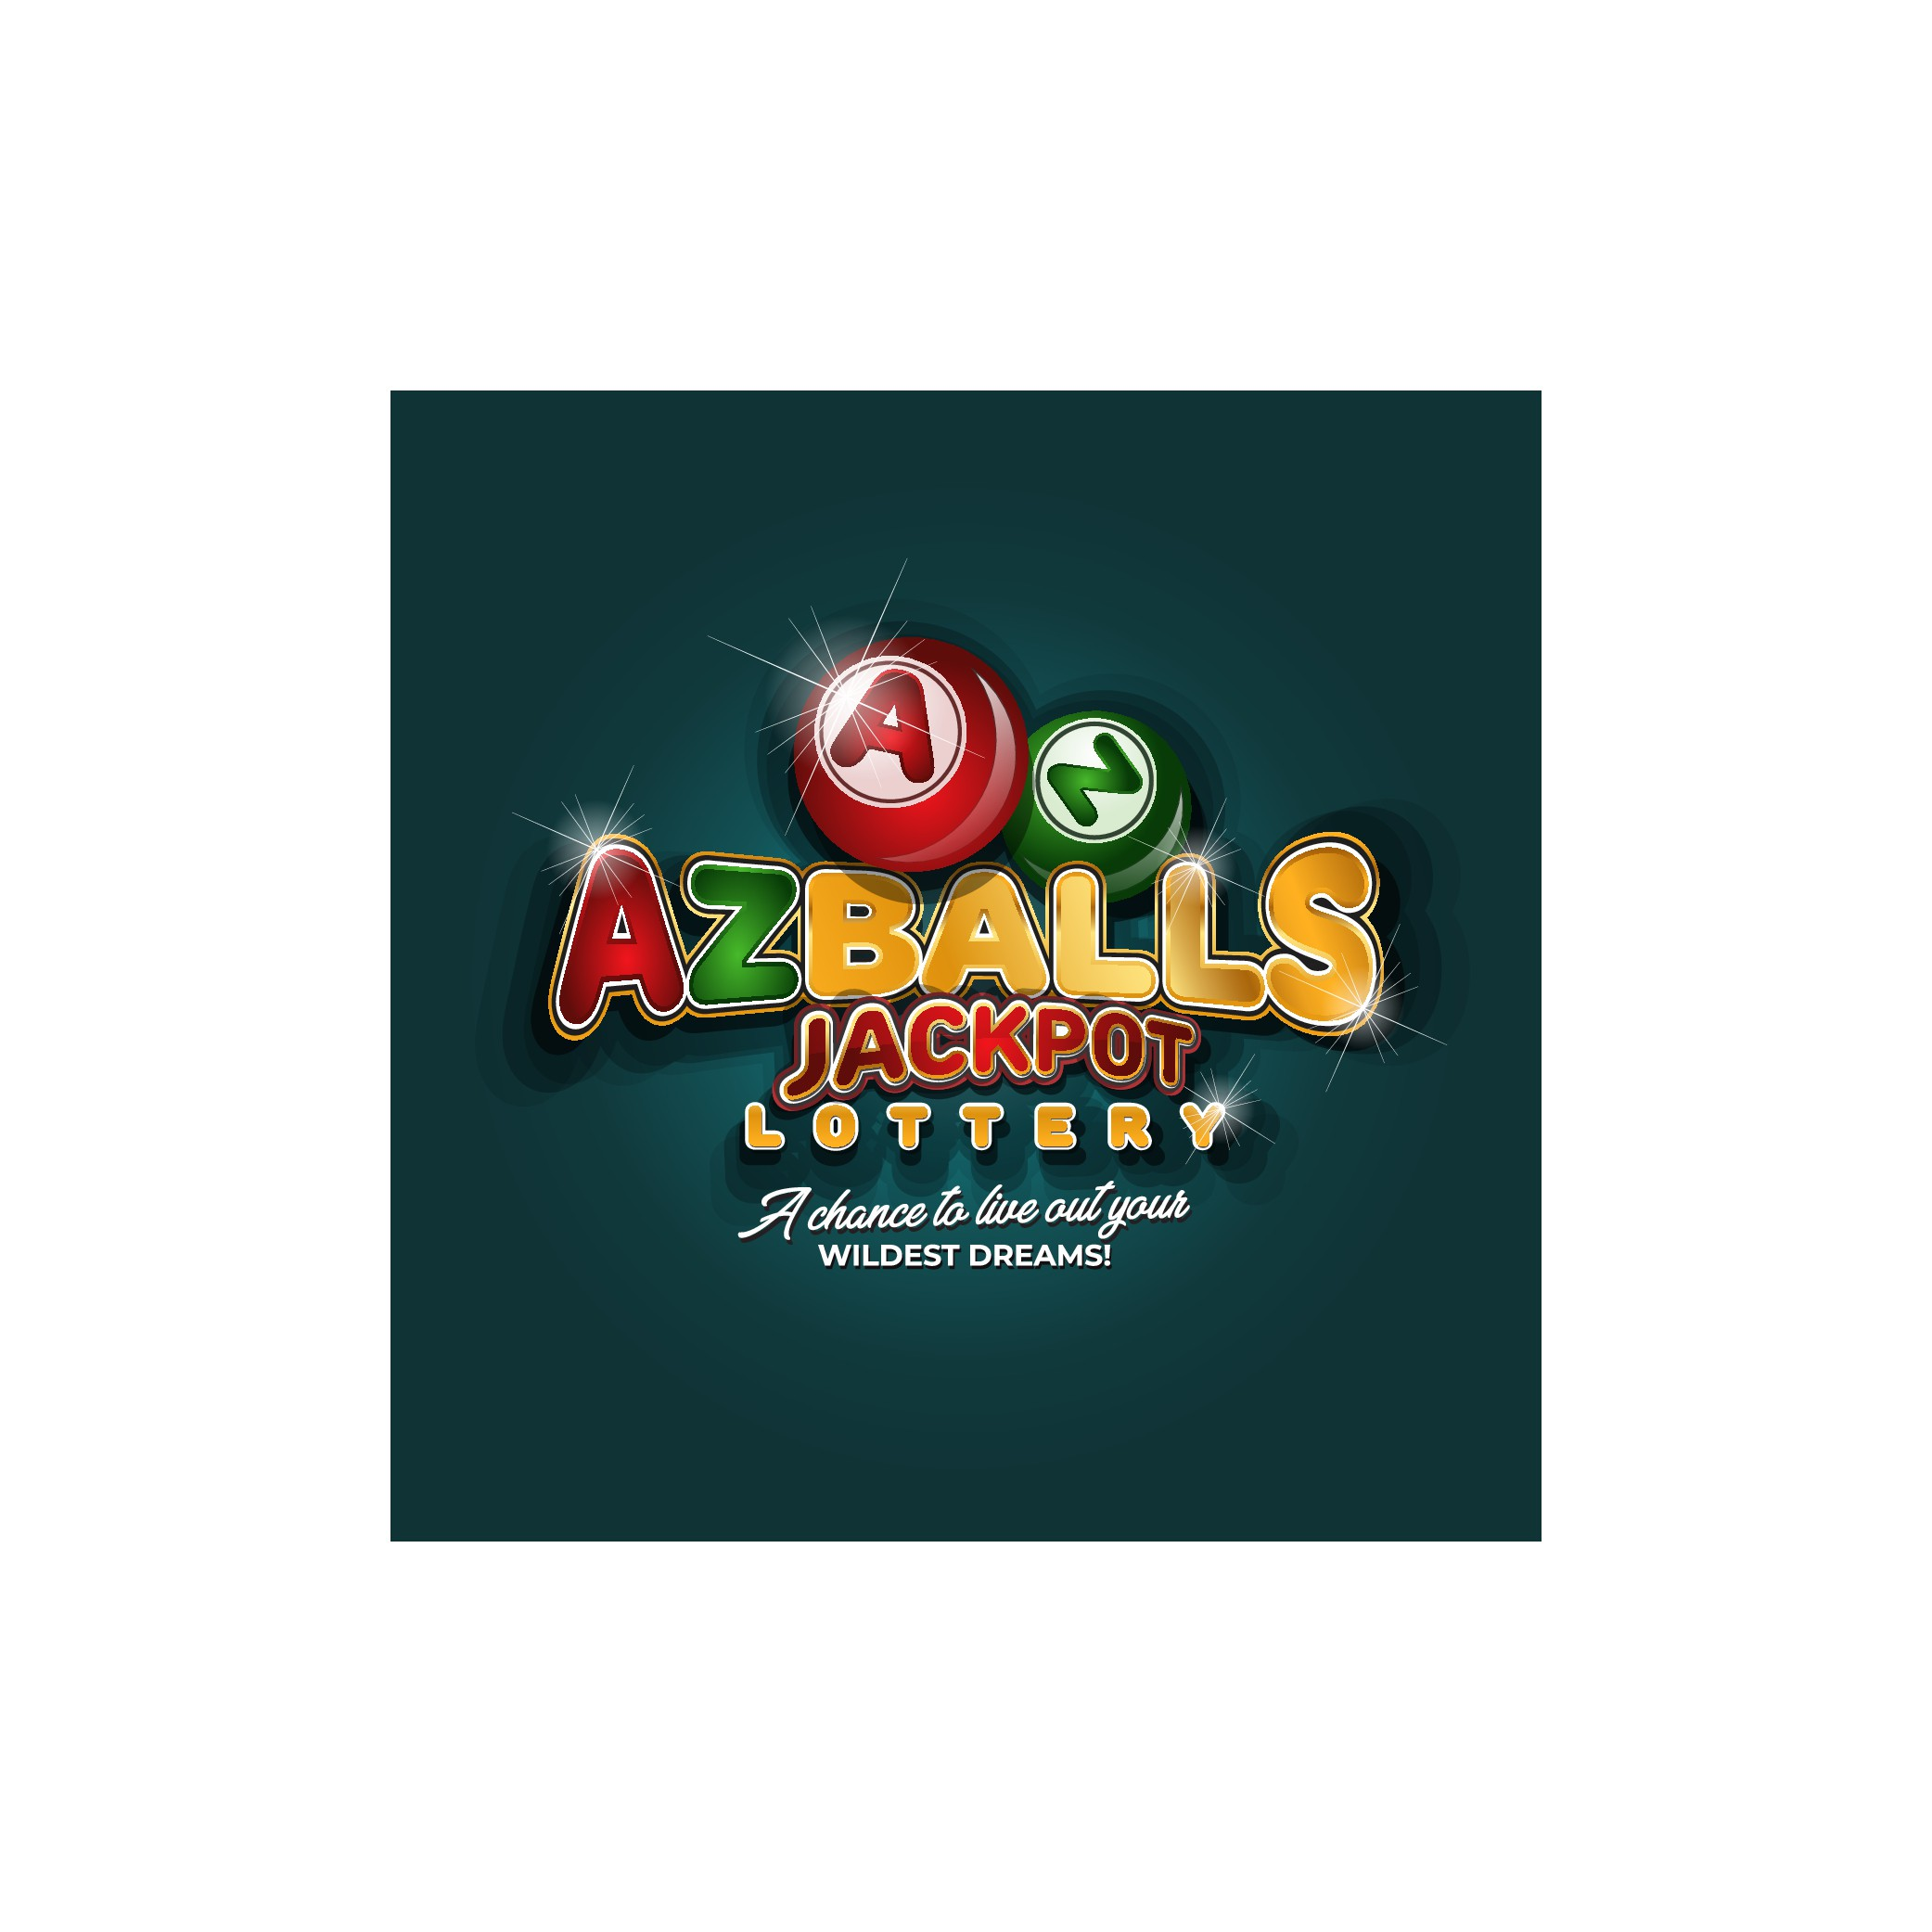 AZballs jackpot lottery needs a lotto style logo using the alphabet